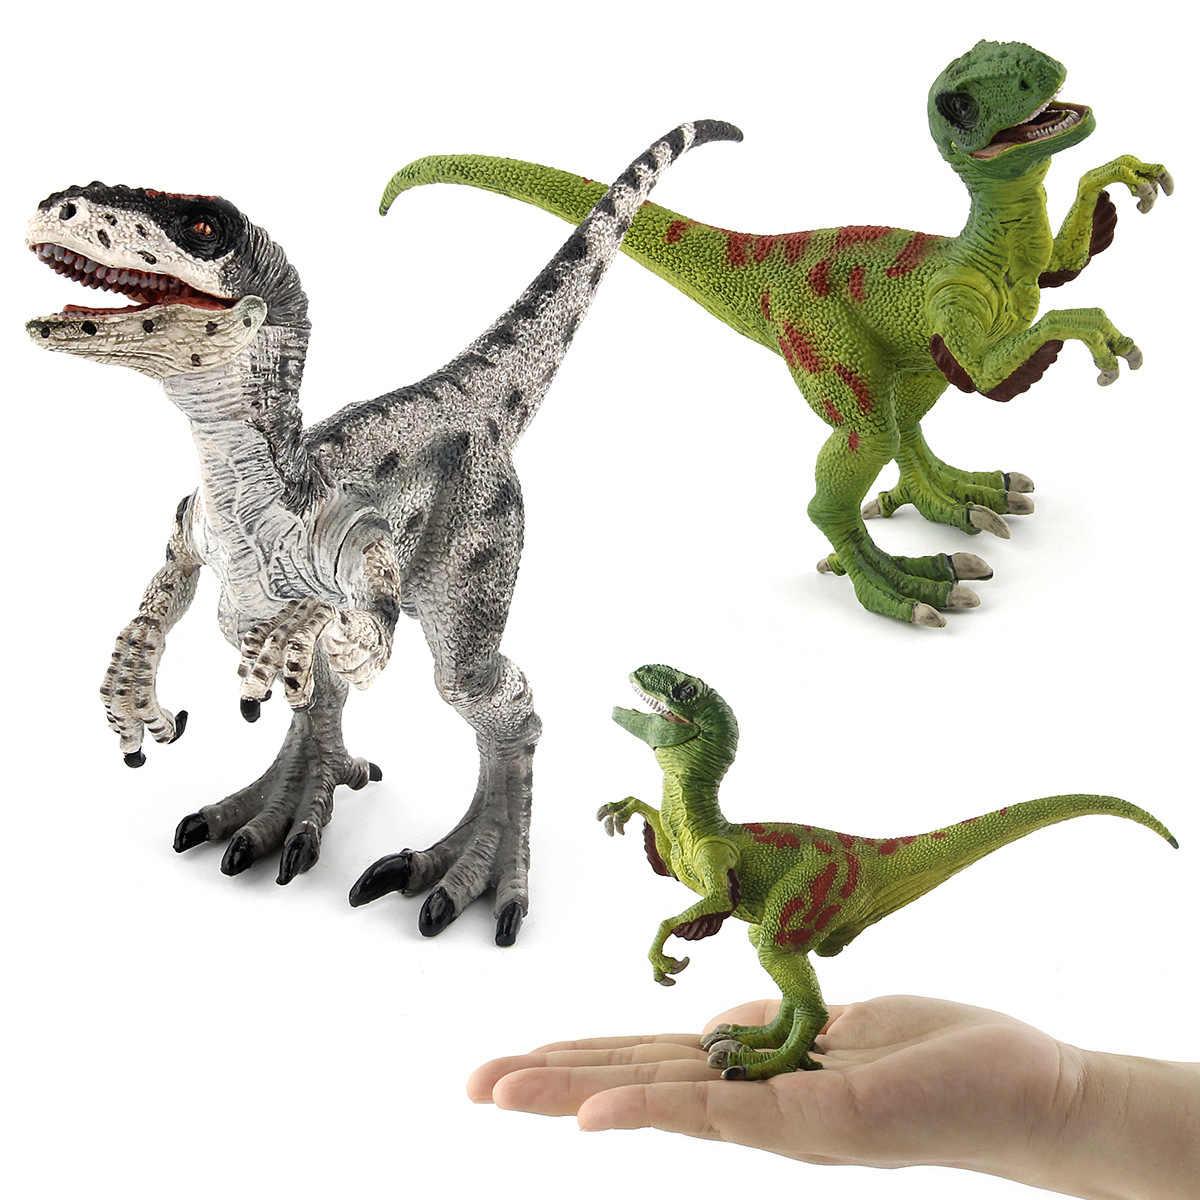 Jurassic World New Dinosaur Toys Velociraptor Model Toys For Children Dinosaurios De Juguete Christmas Gift Toys For Children Action Toy Figures Aliexpress Интерактивный динозавр jiabaile dinosaur 908c. www aliexpress com